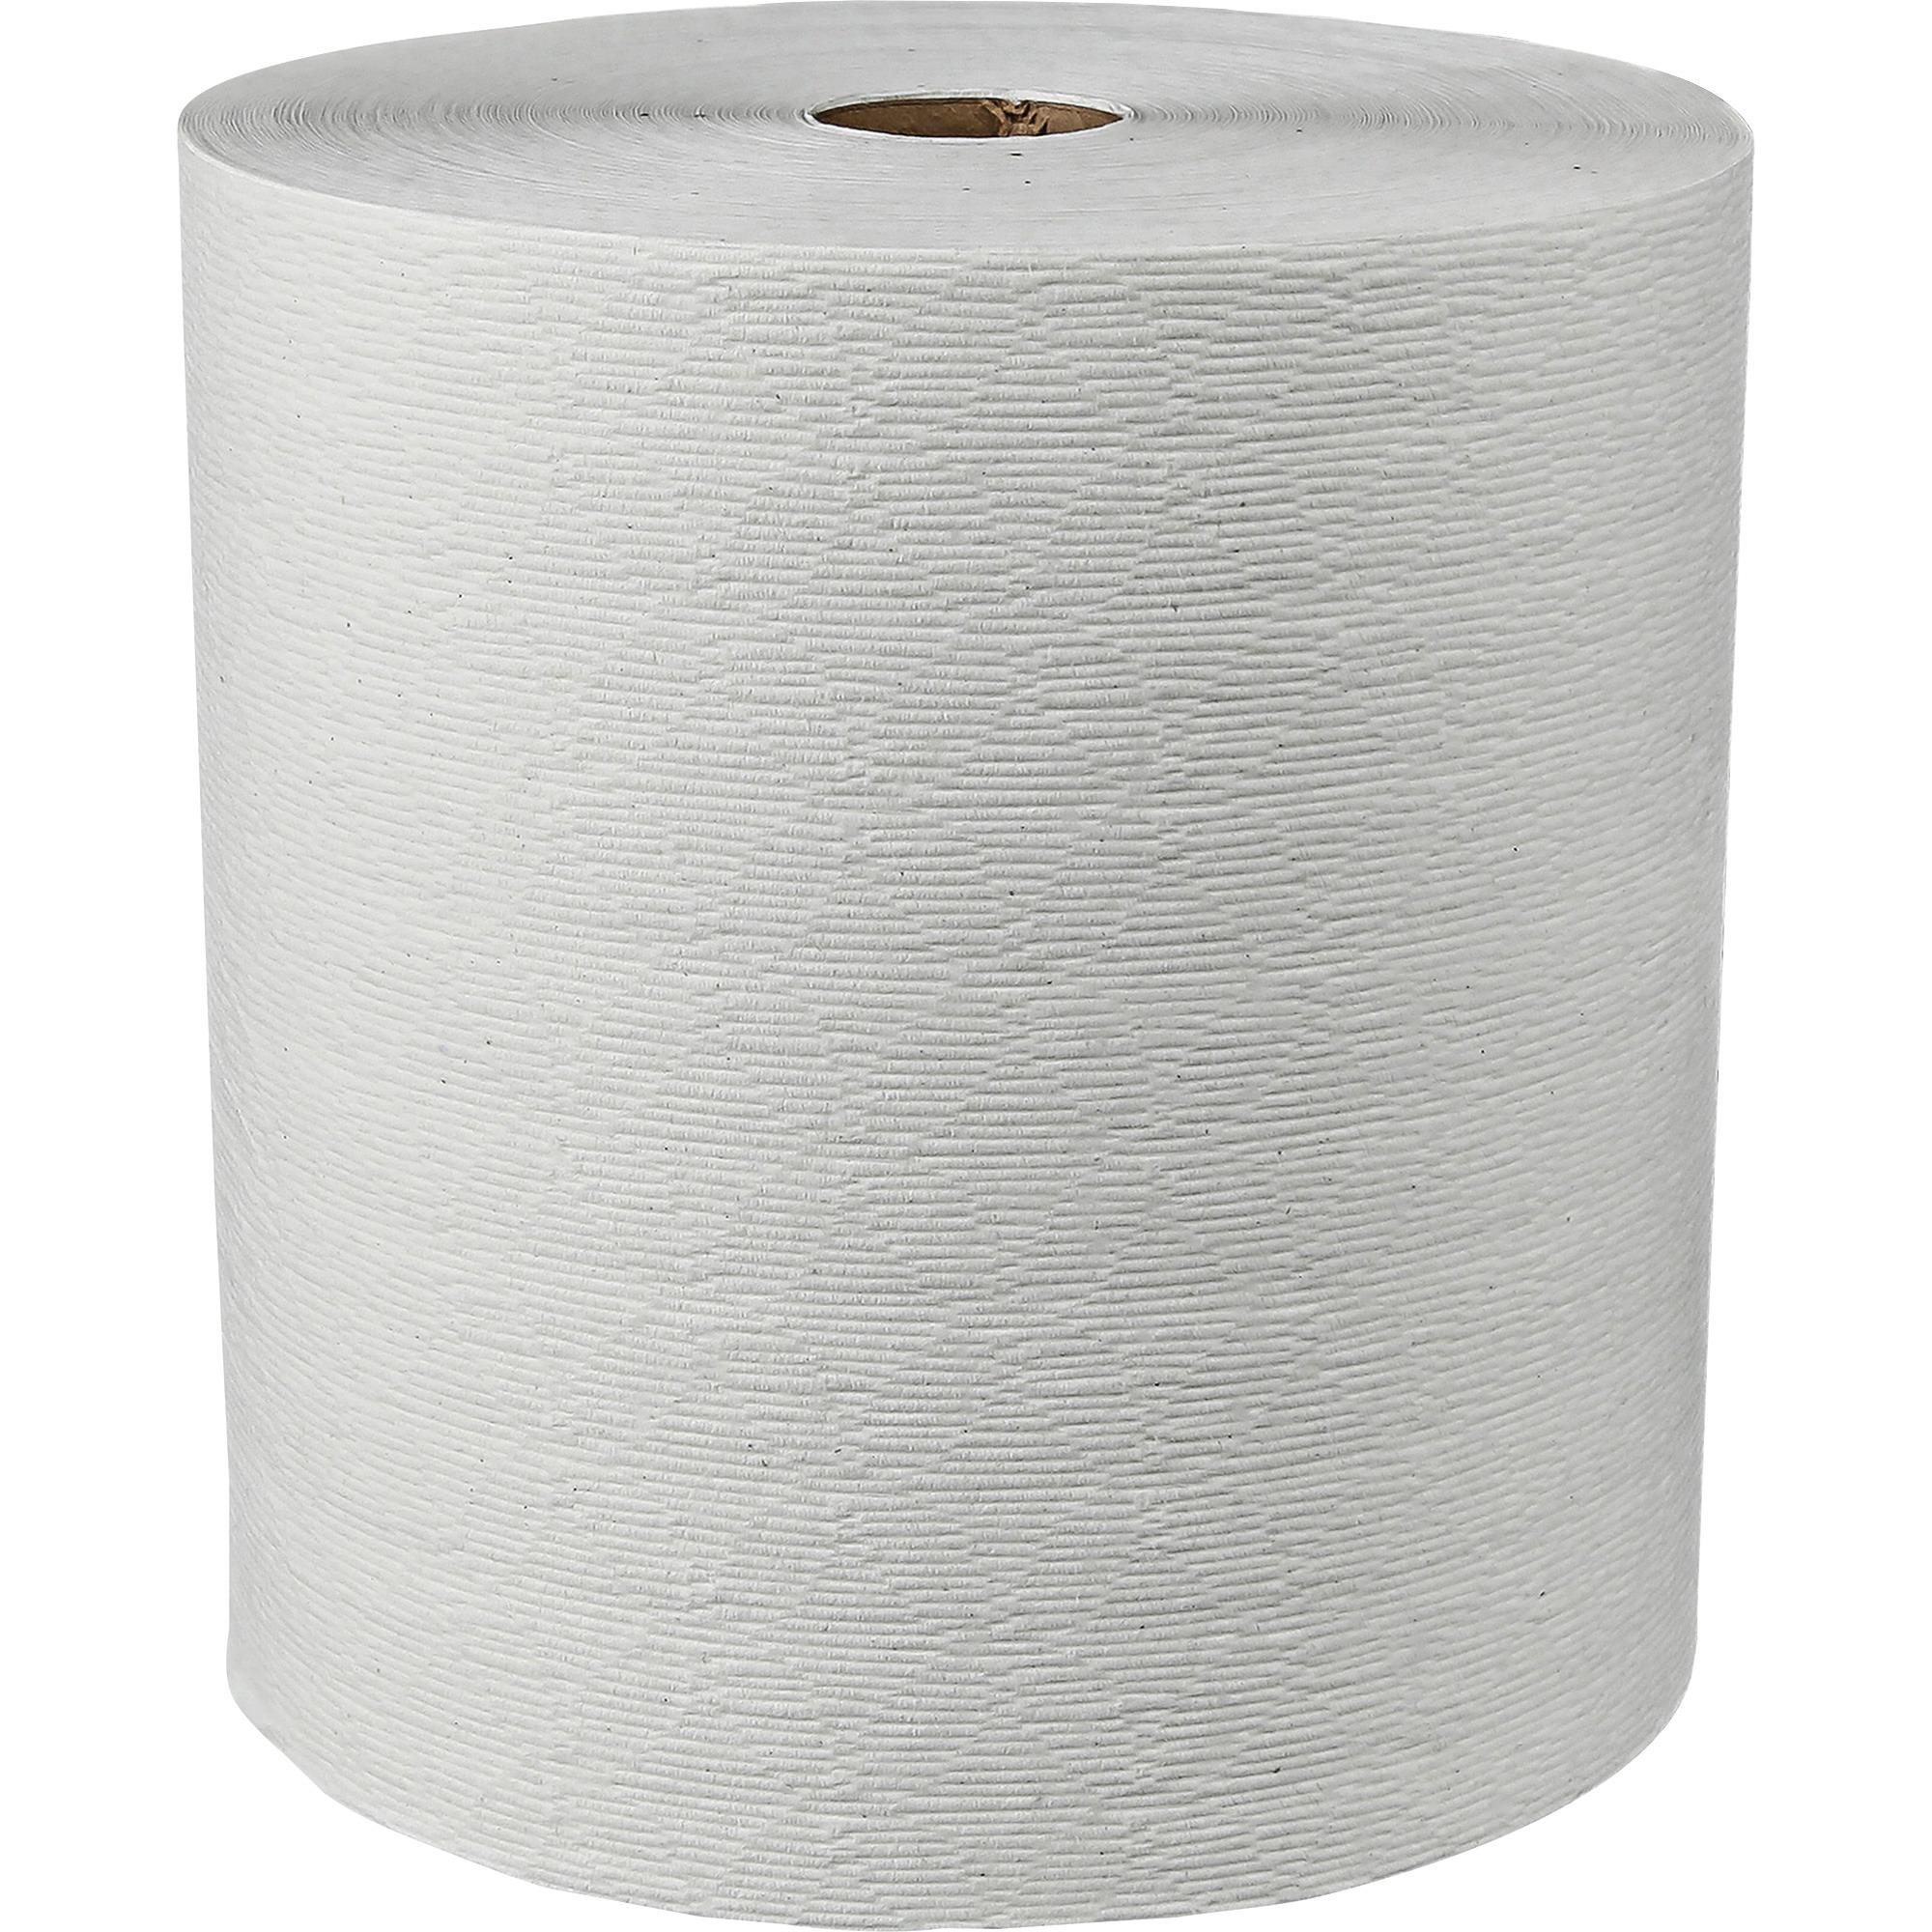 Kleenex, KCC11090, 600' Hard Roll Towels, 6 / Carton, White